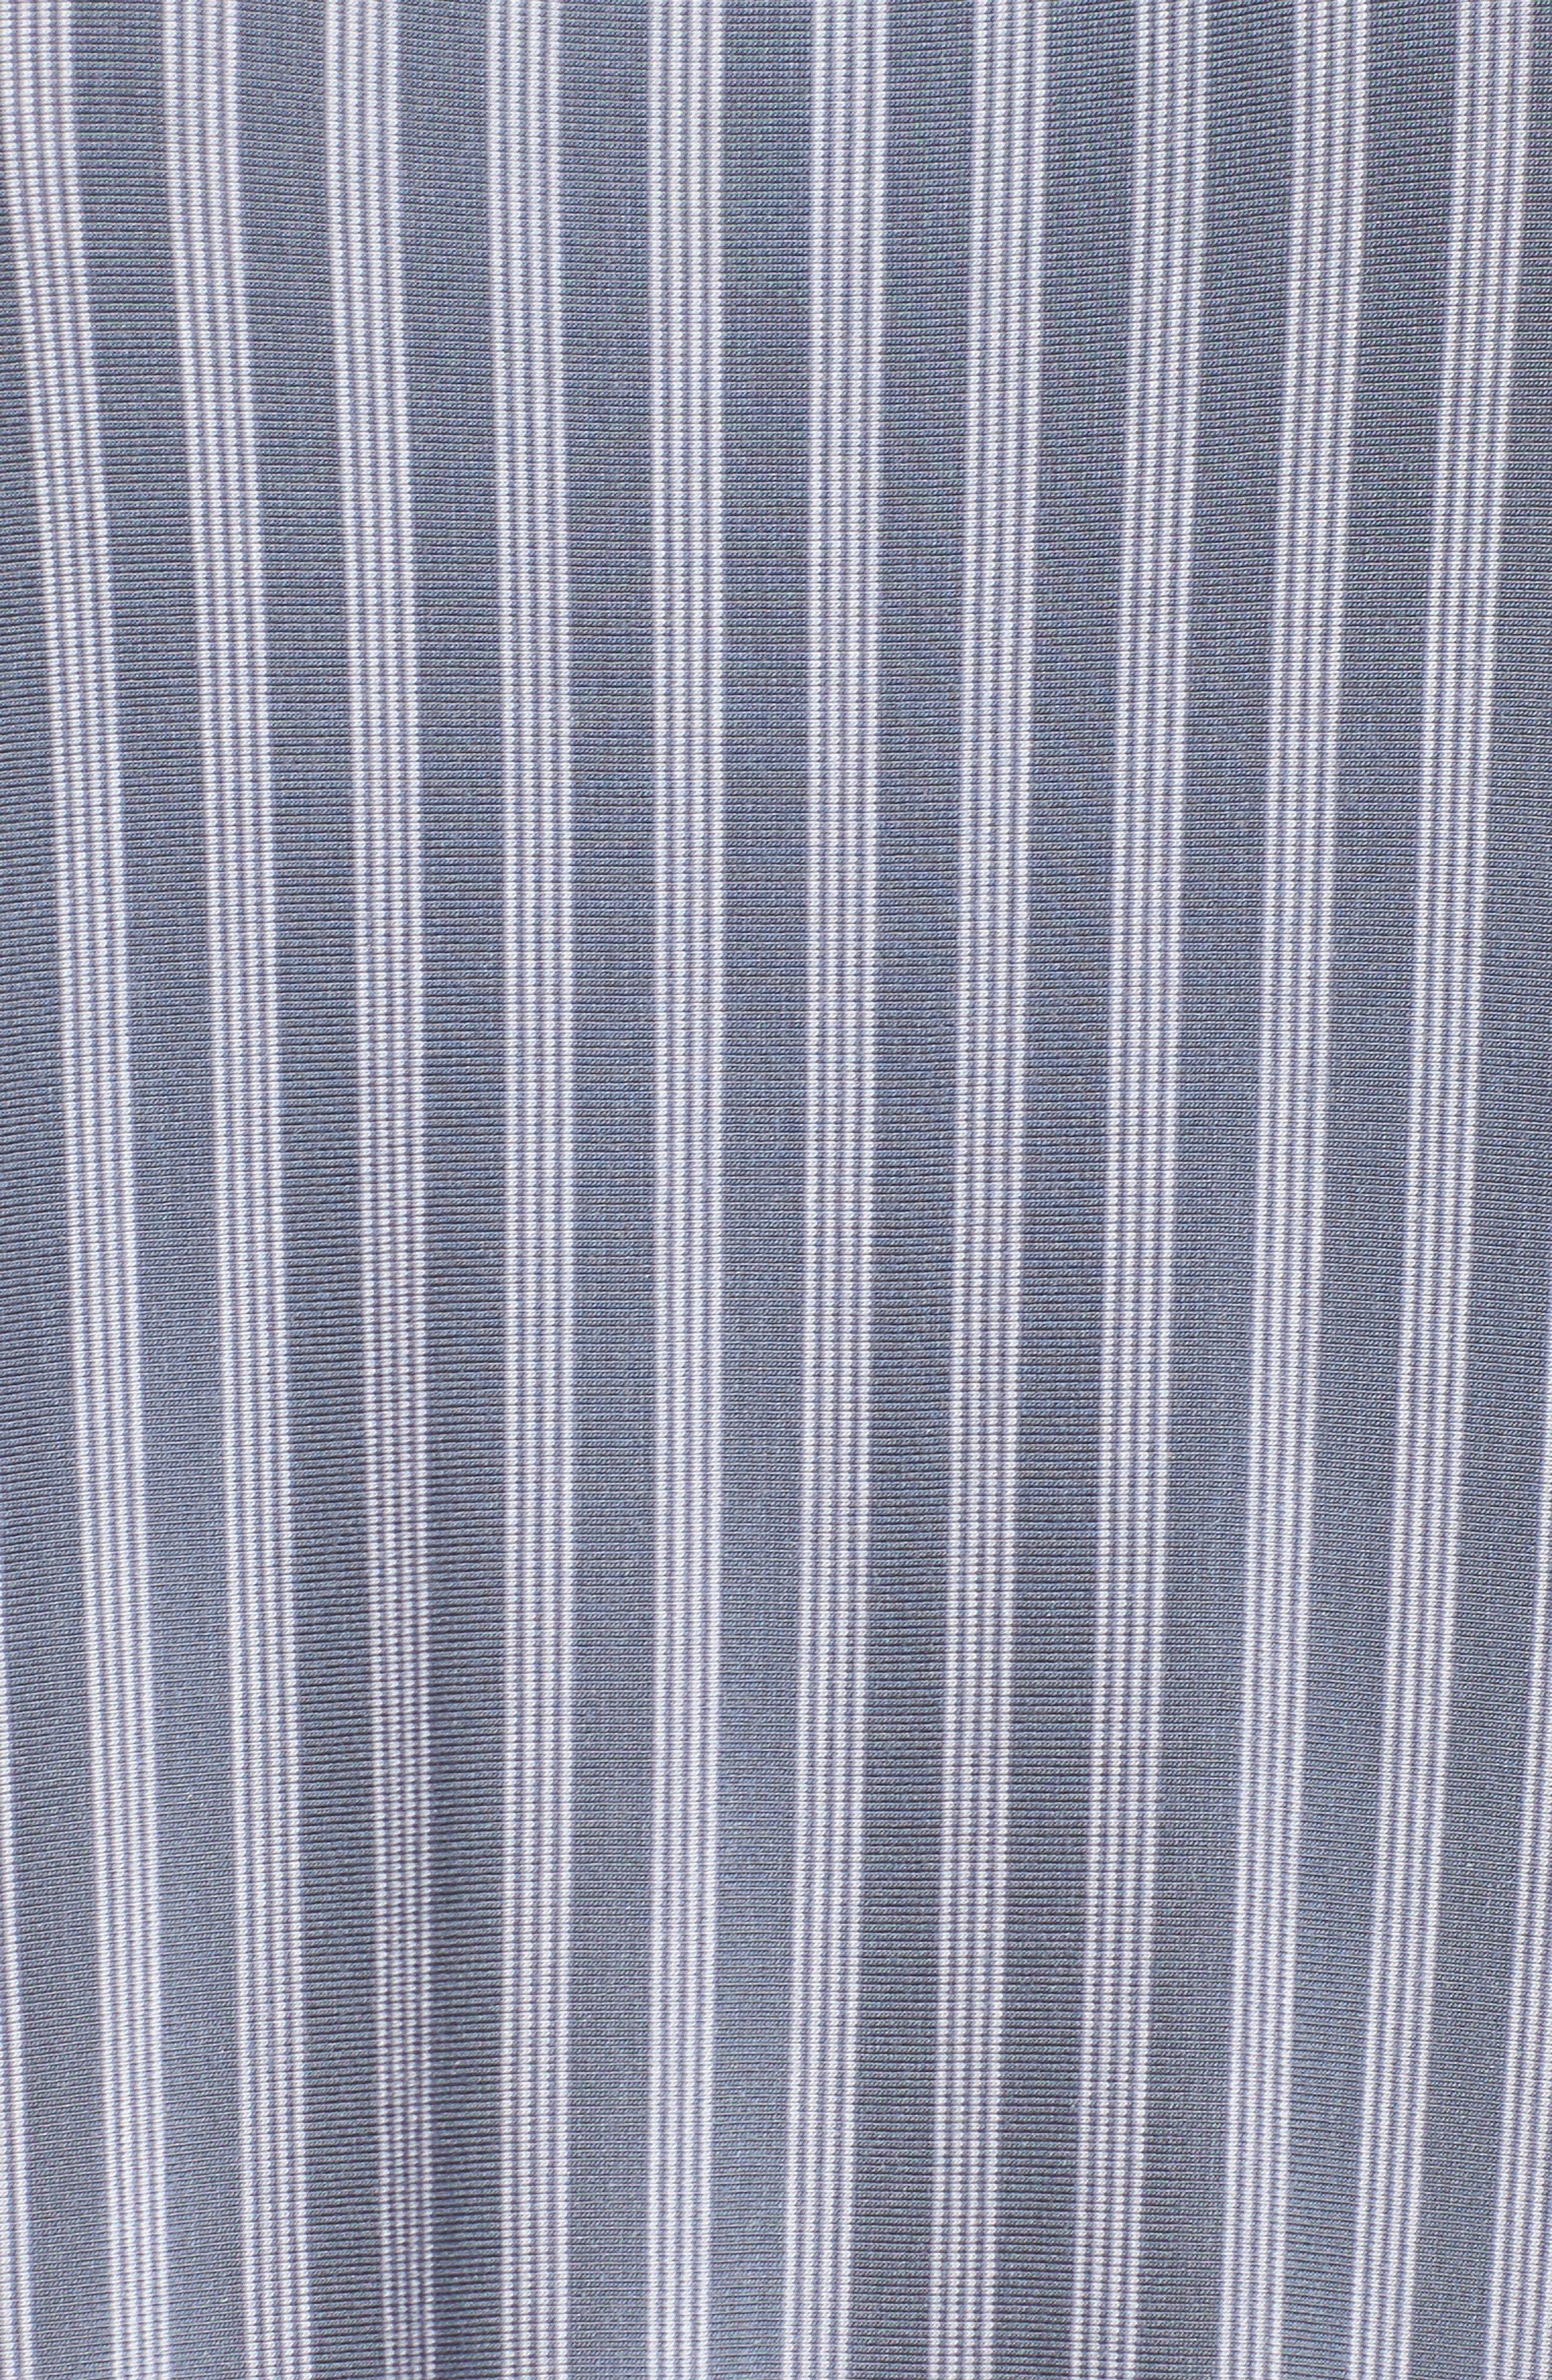 Long Chemise,                             Alternate thumbnail 6, color,                             Blue Stone Stripe